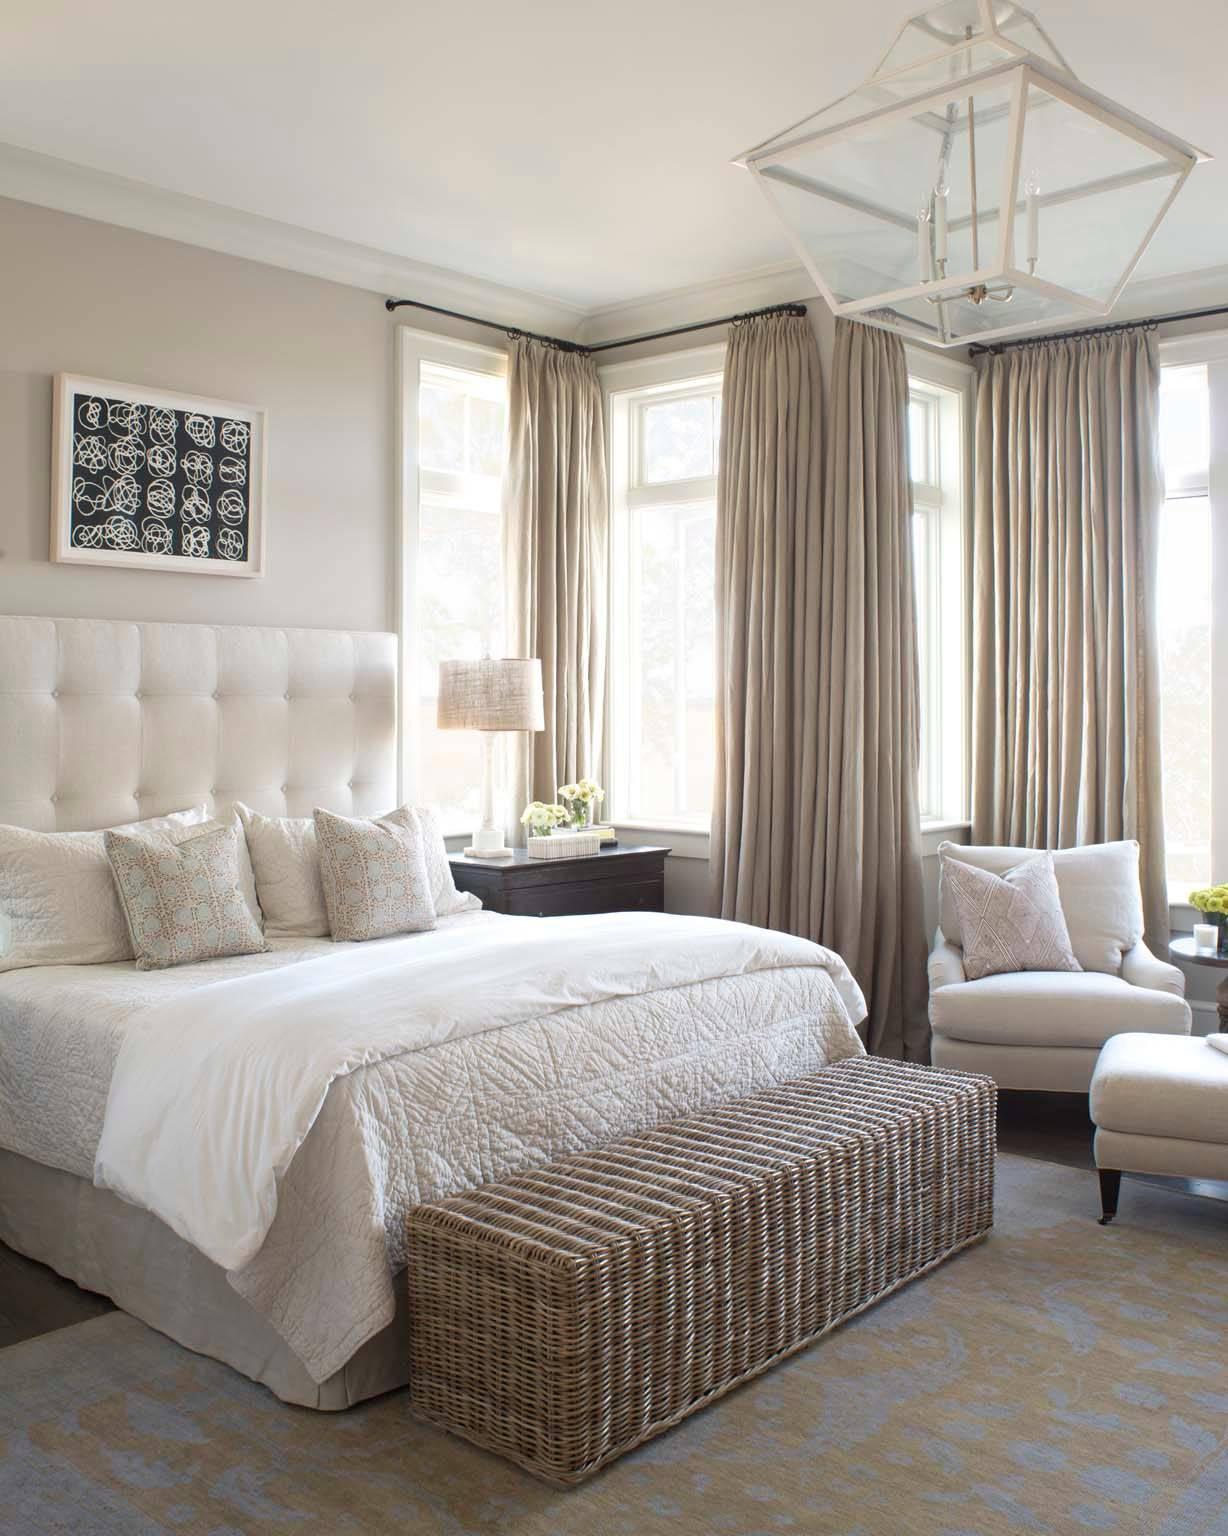 5 Easy Steps To Designing A Super Cozy Bedroom Shop Room Ideas